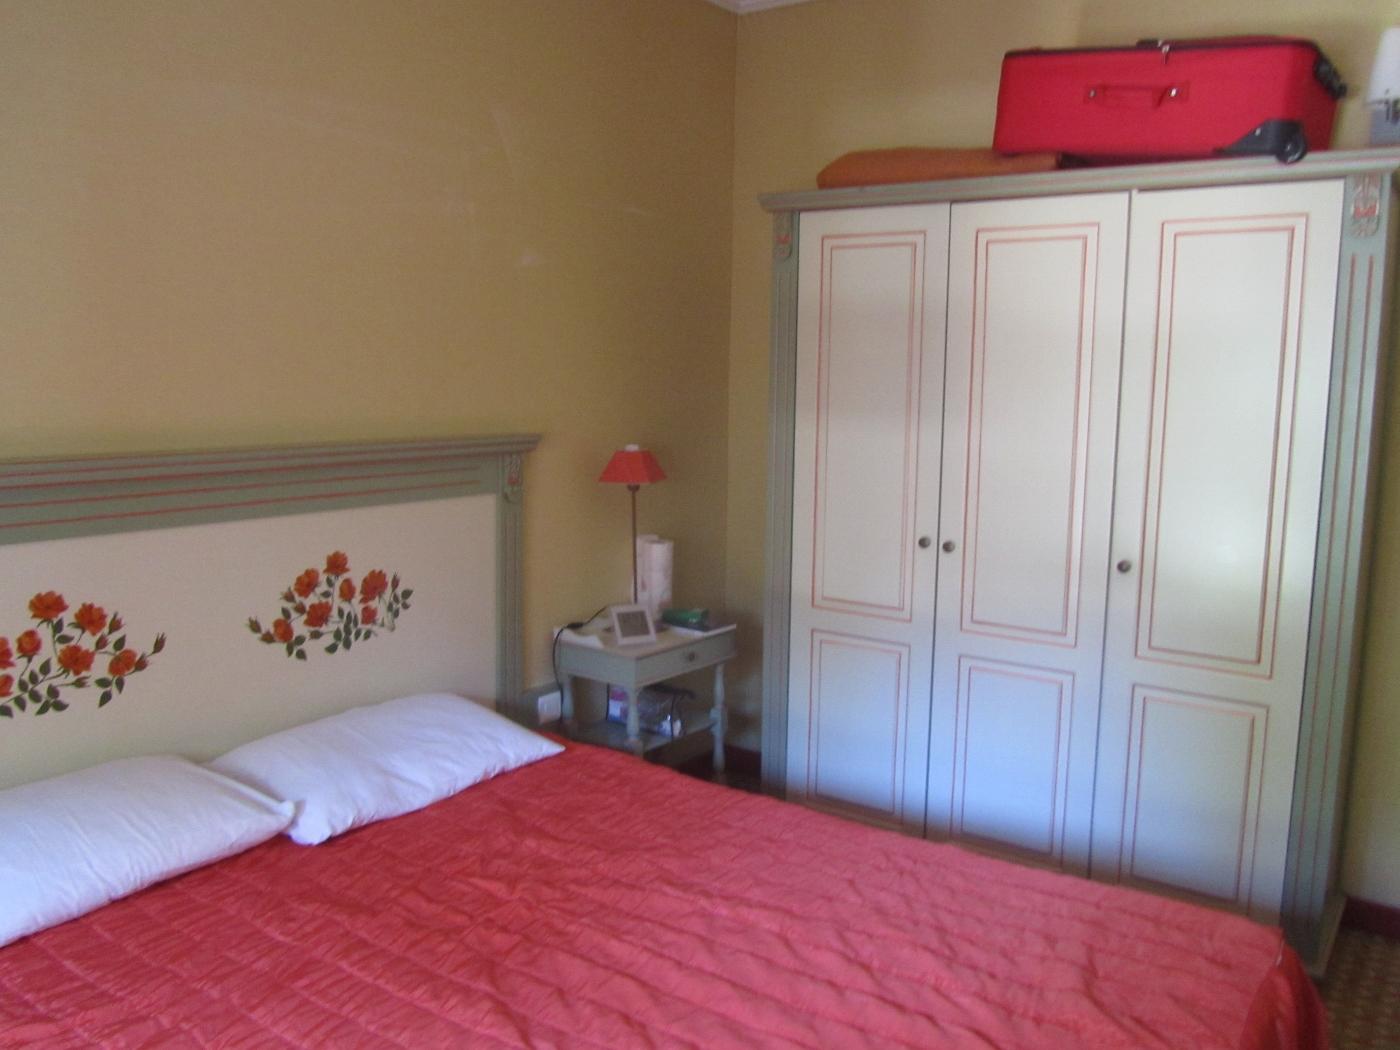 vacances en club 2 me partie la chambre ma retraite fond. Black Bedroom Furniture Sets. Home Design Ideas